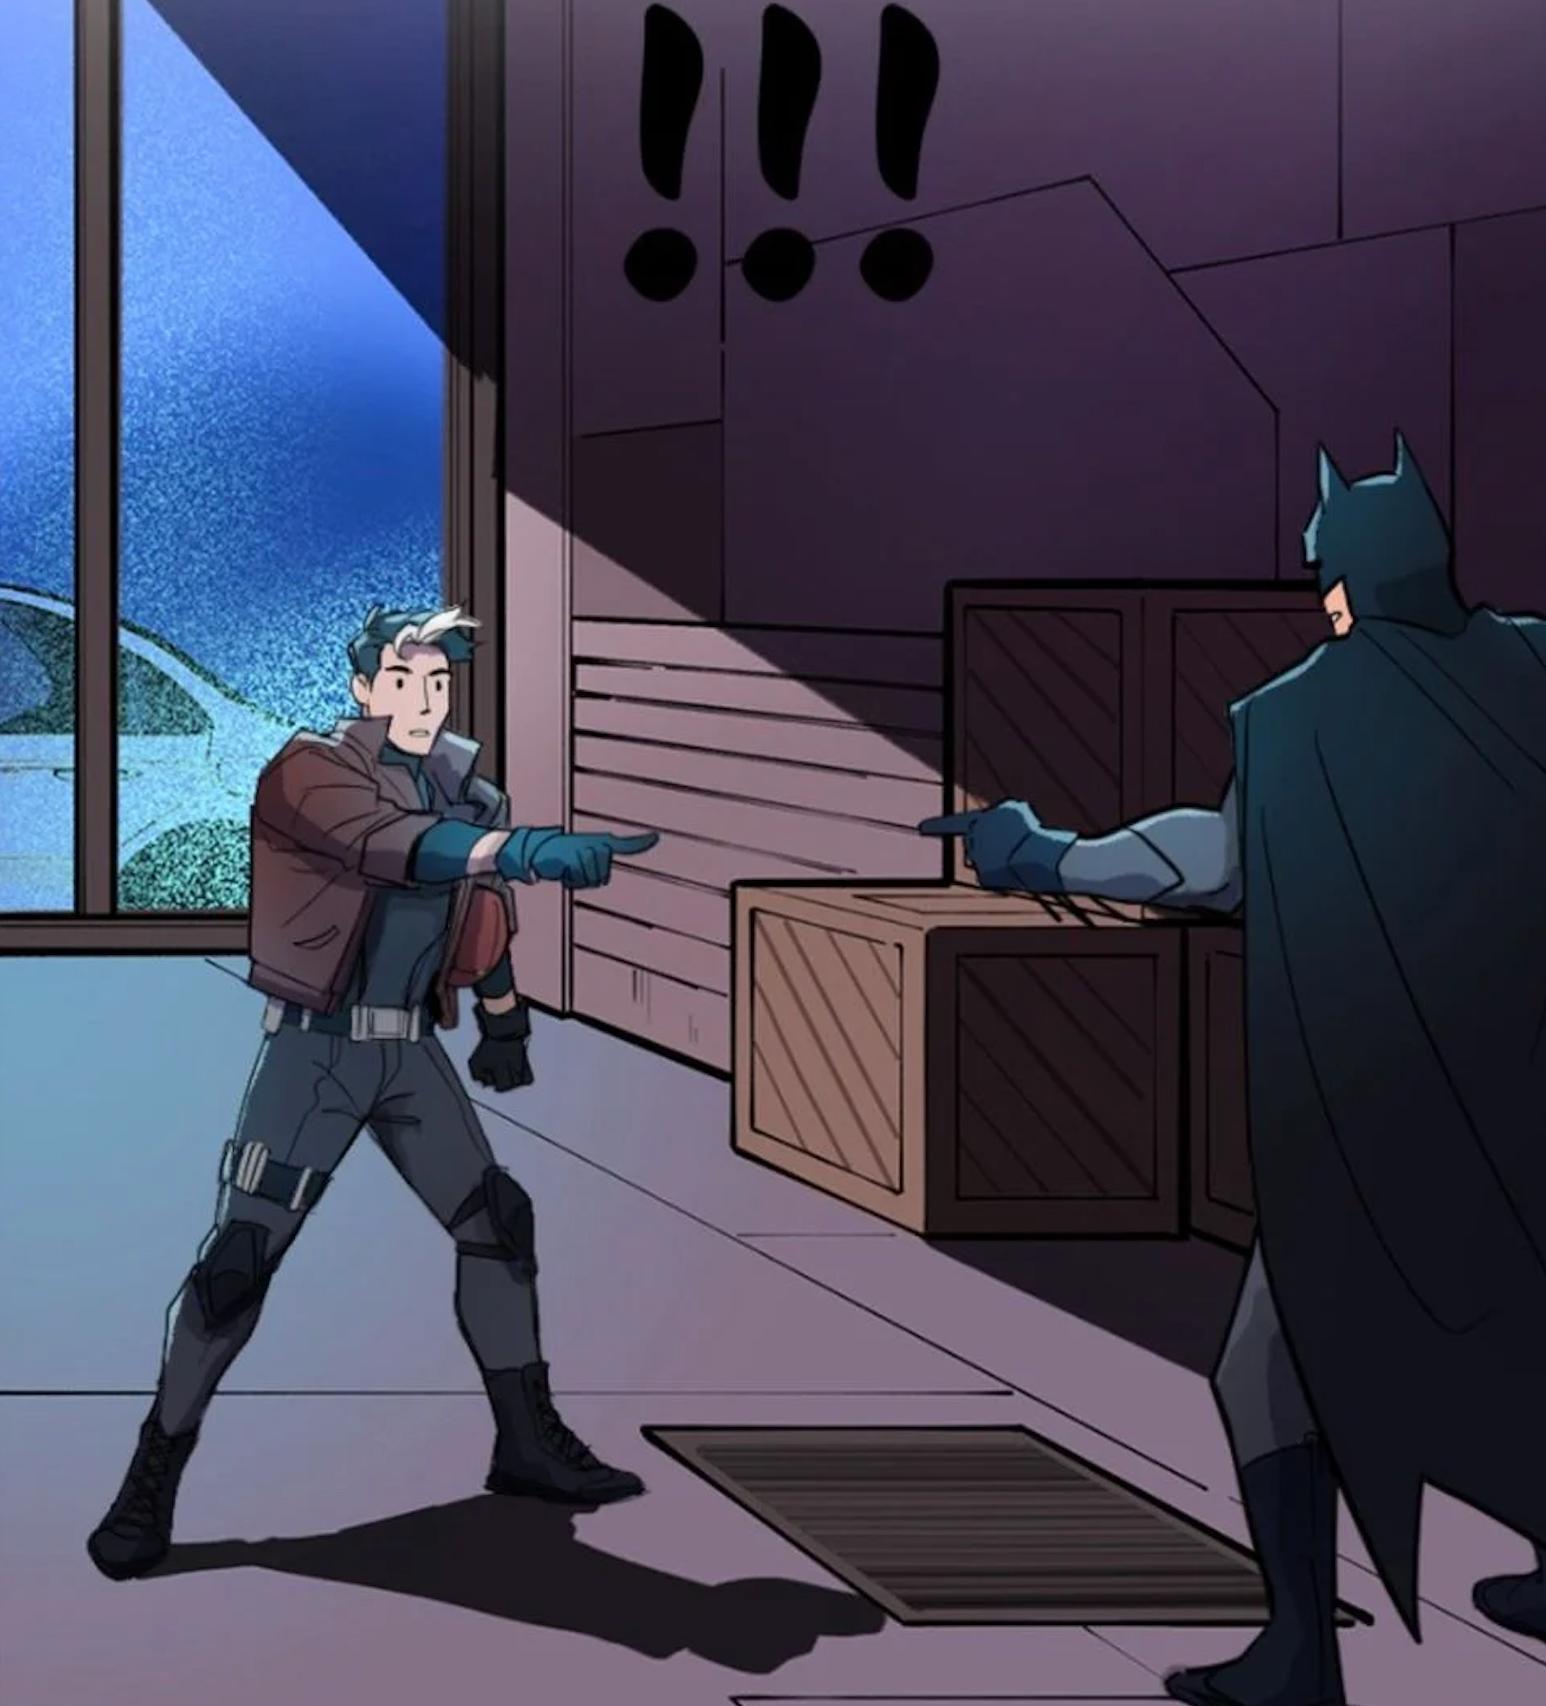 batman-webtoon-spider-man-pointing-meme.png